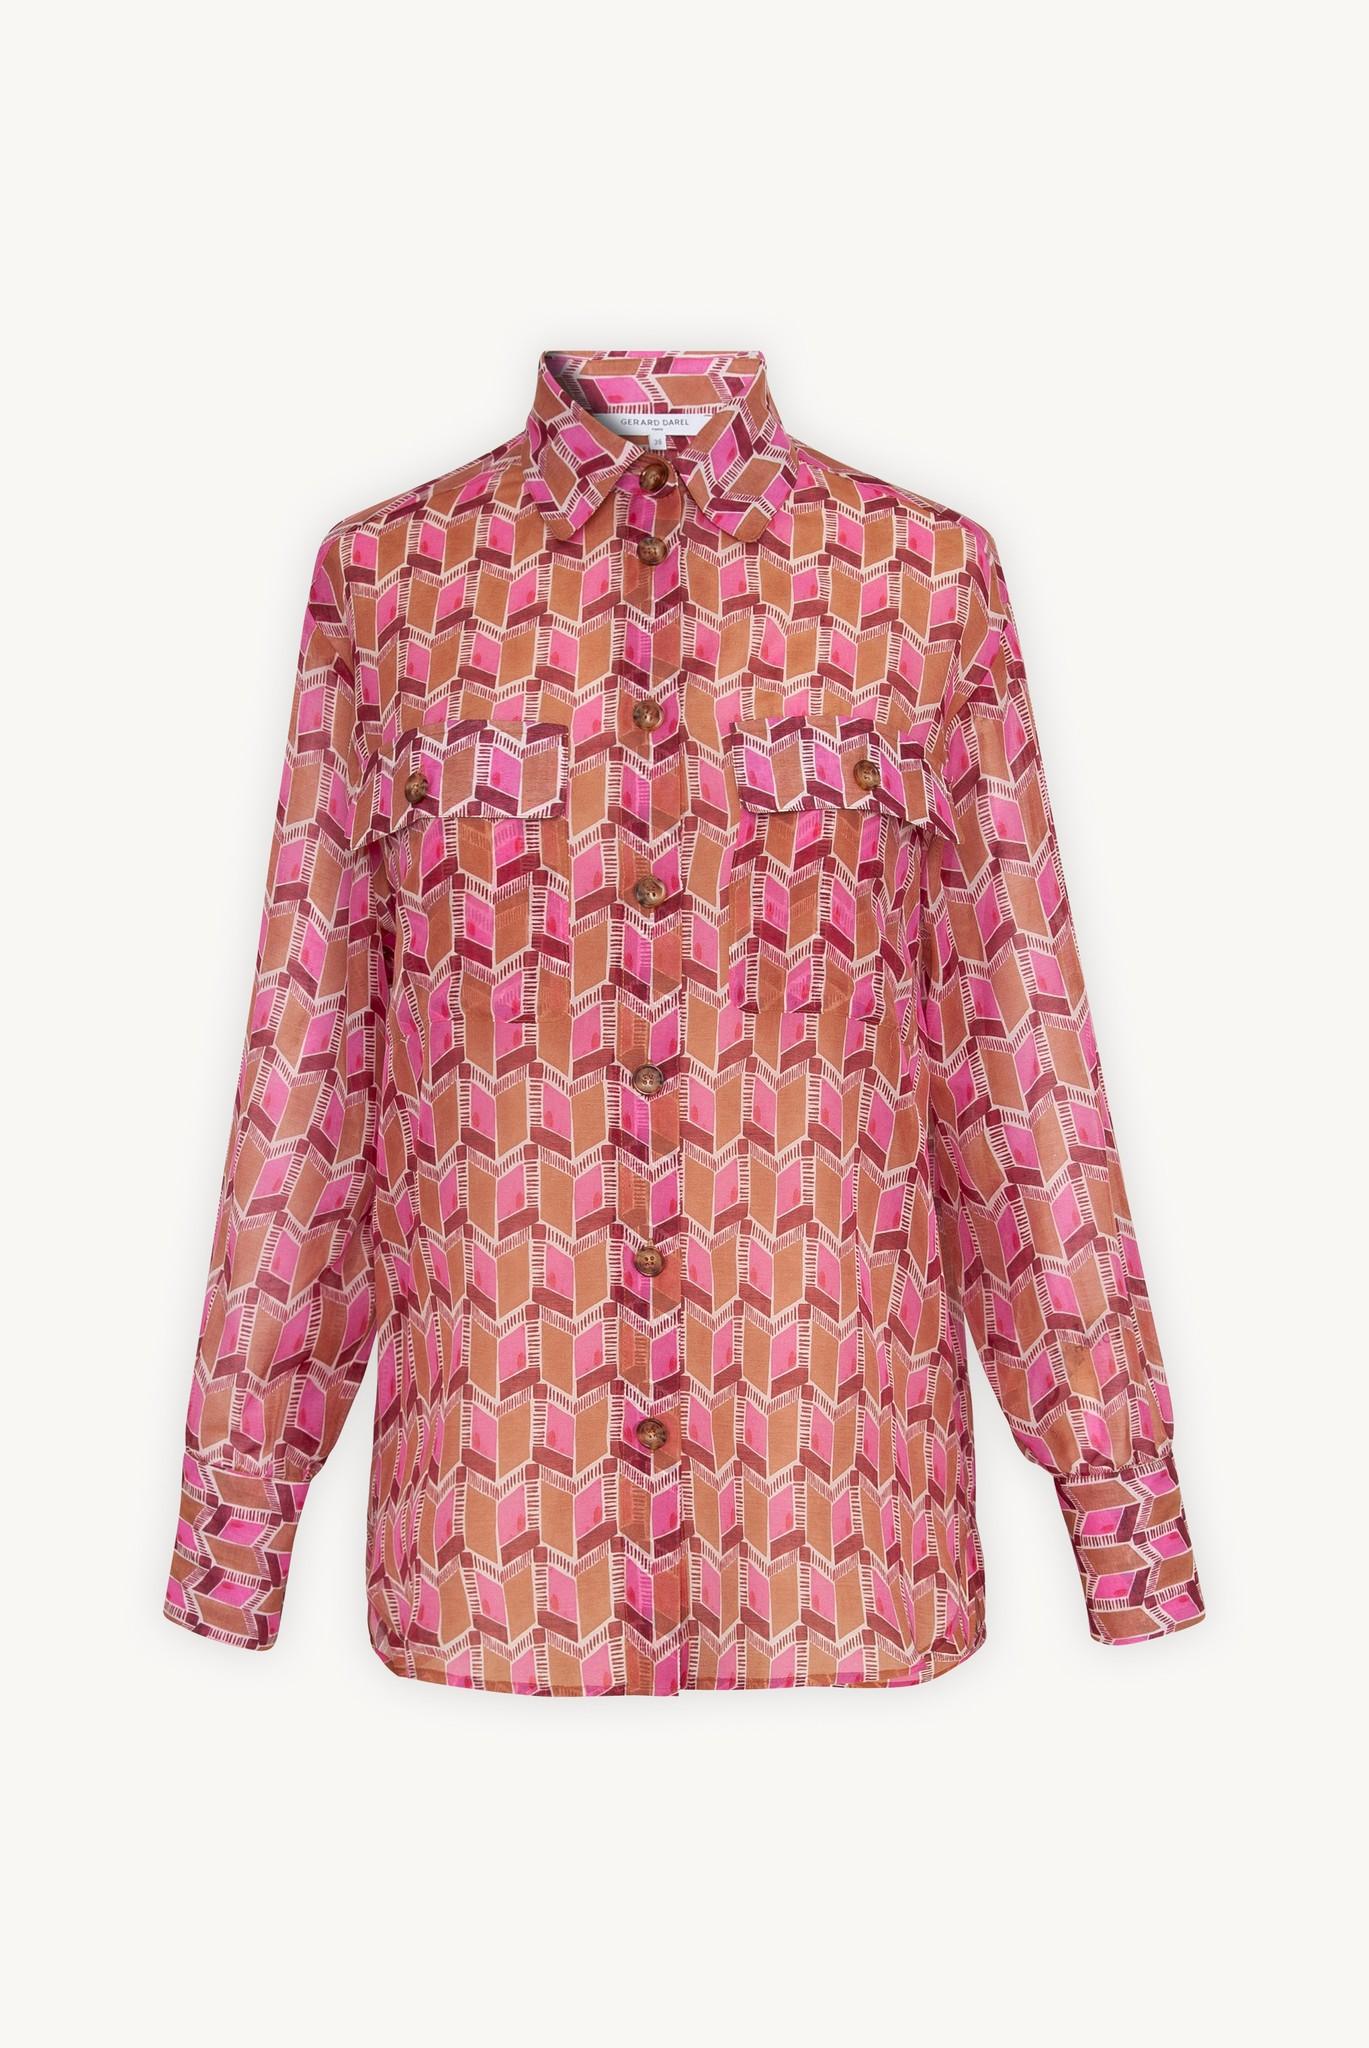 NAIS - рубашка из шелка и хлопка с принтом